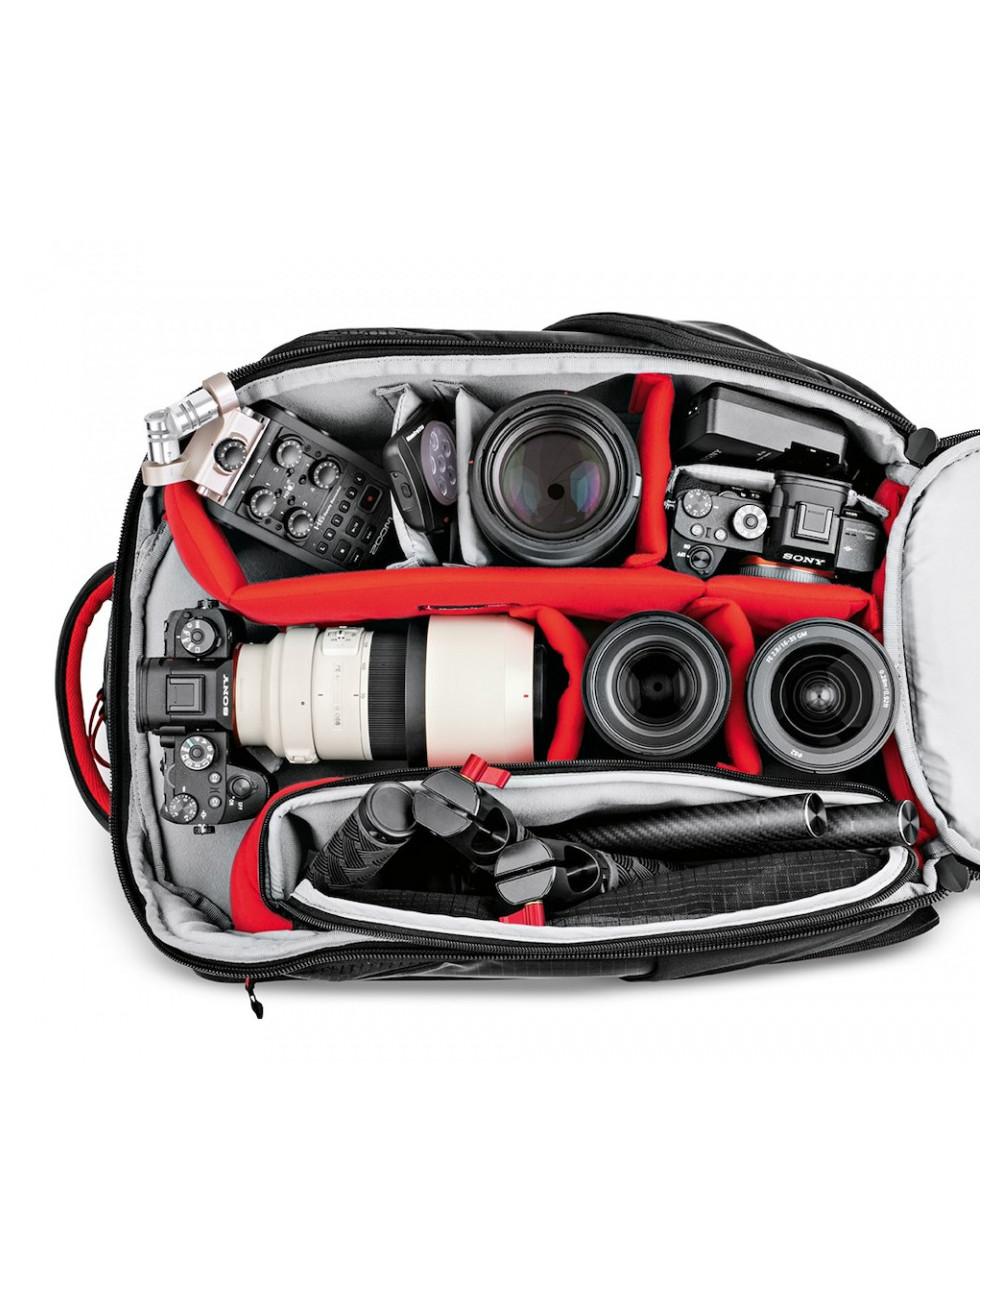 Micrófono Inalámbrico de Mano Rode Link Performer Kit - Para escenarios, conferencias, sala de clases